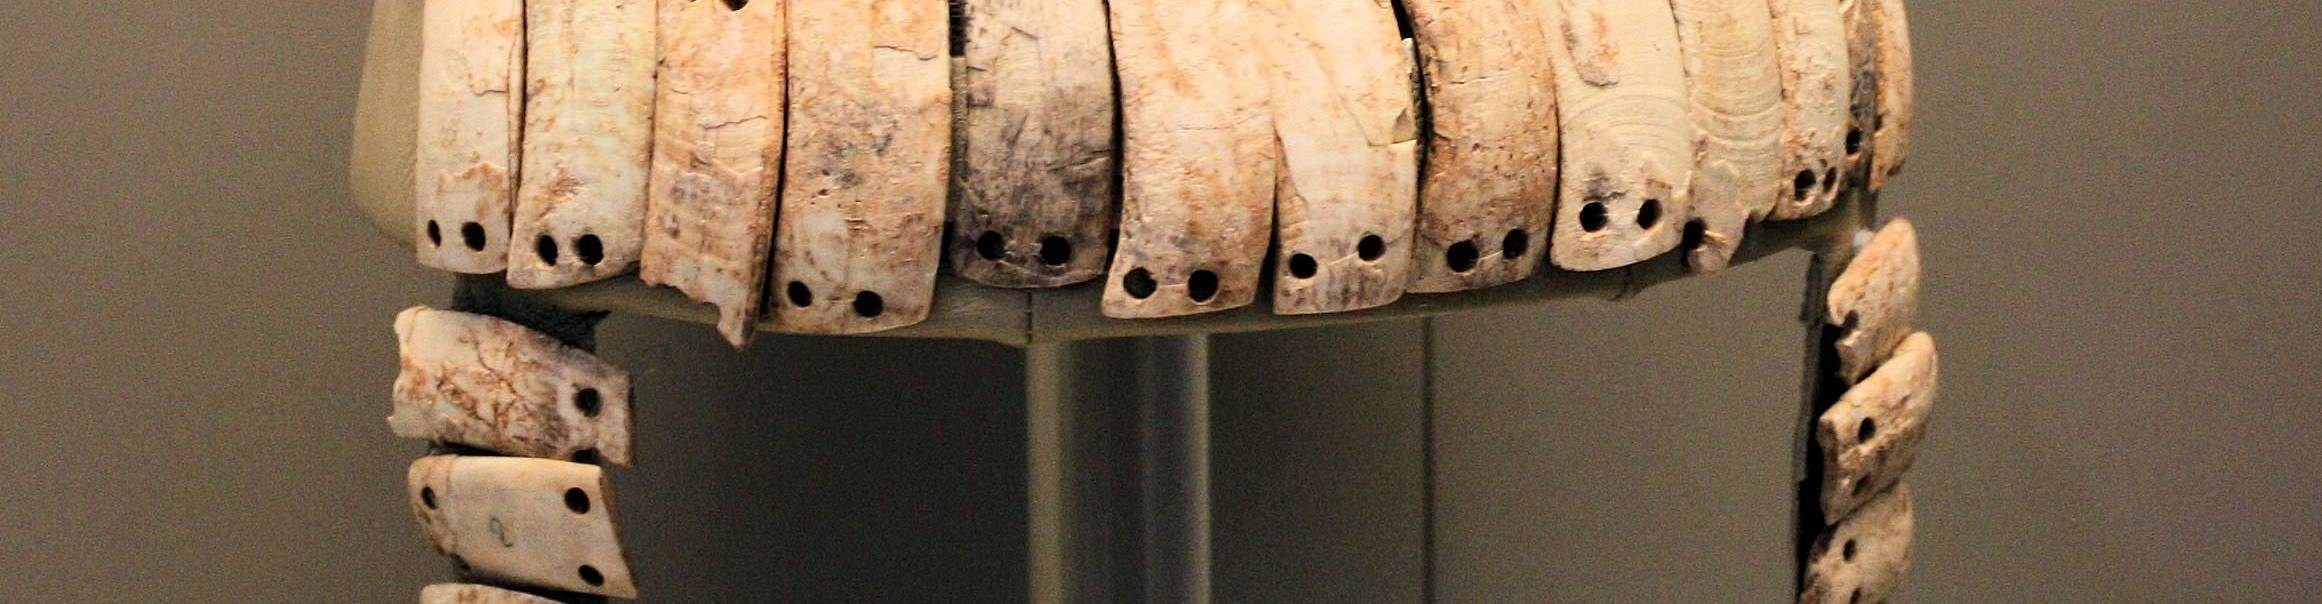 virmuze exhibit Mycenaean Tusk Helmet logo main banner